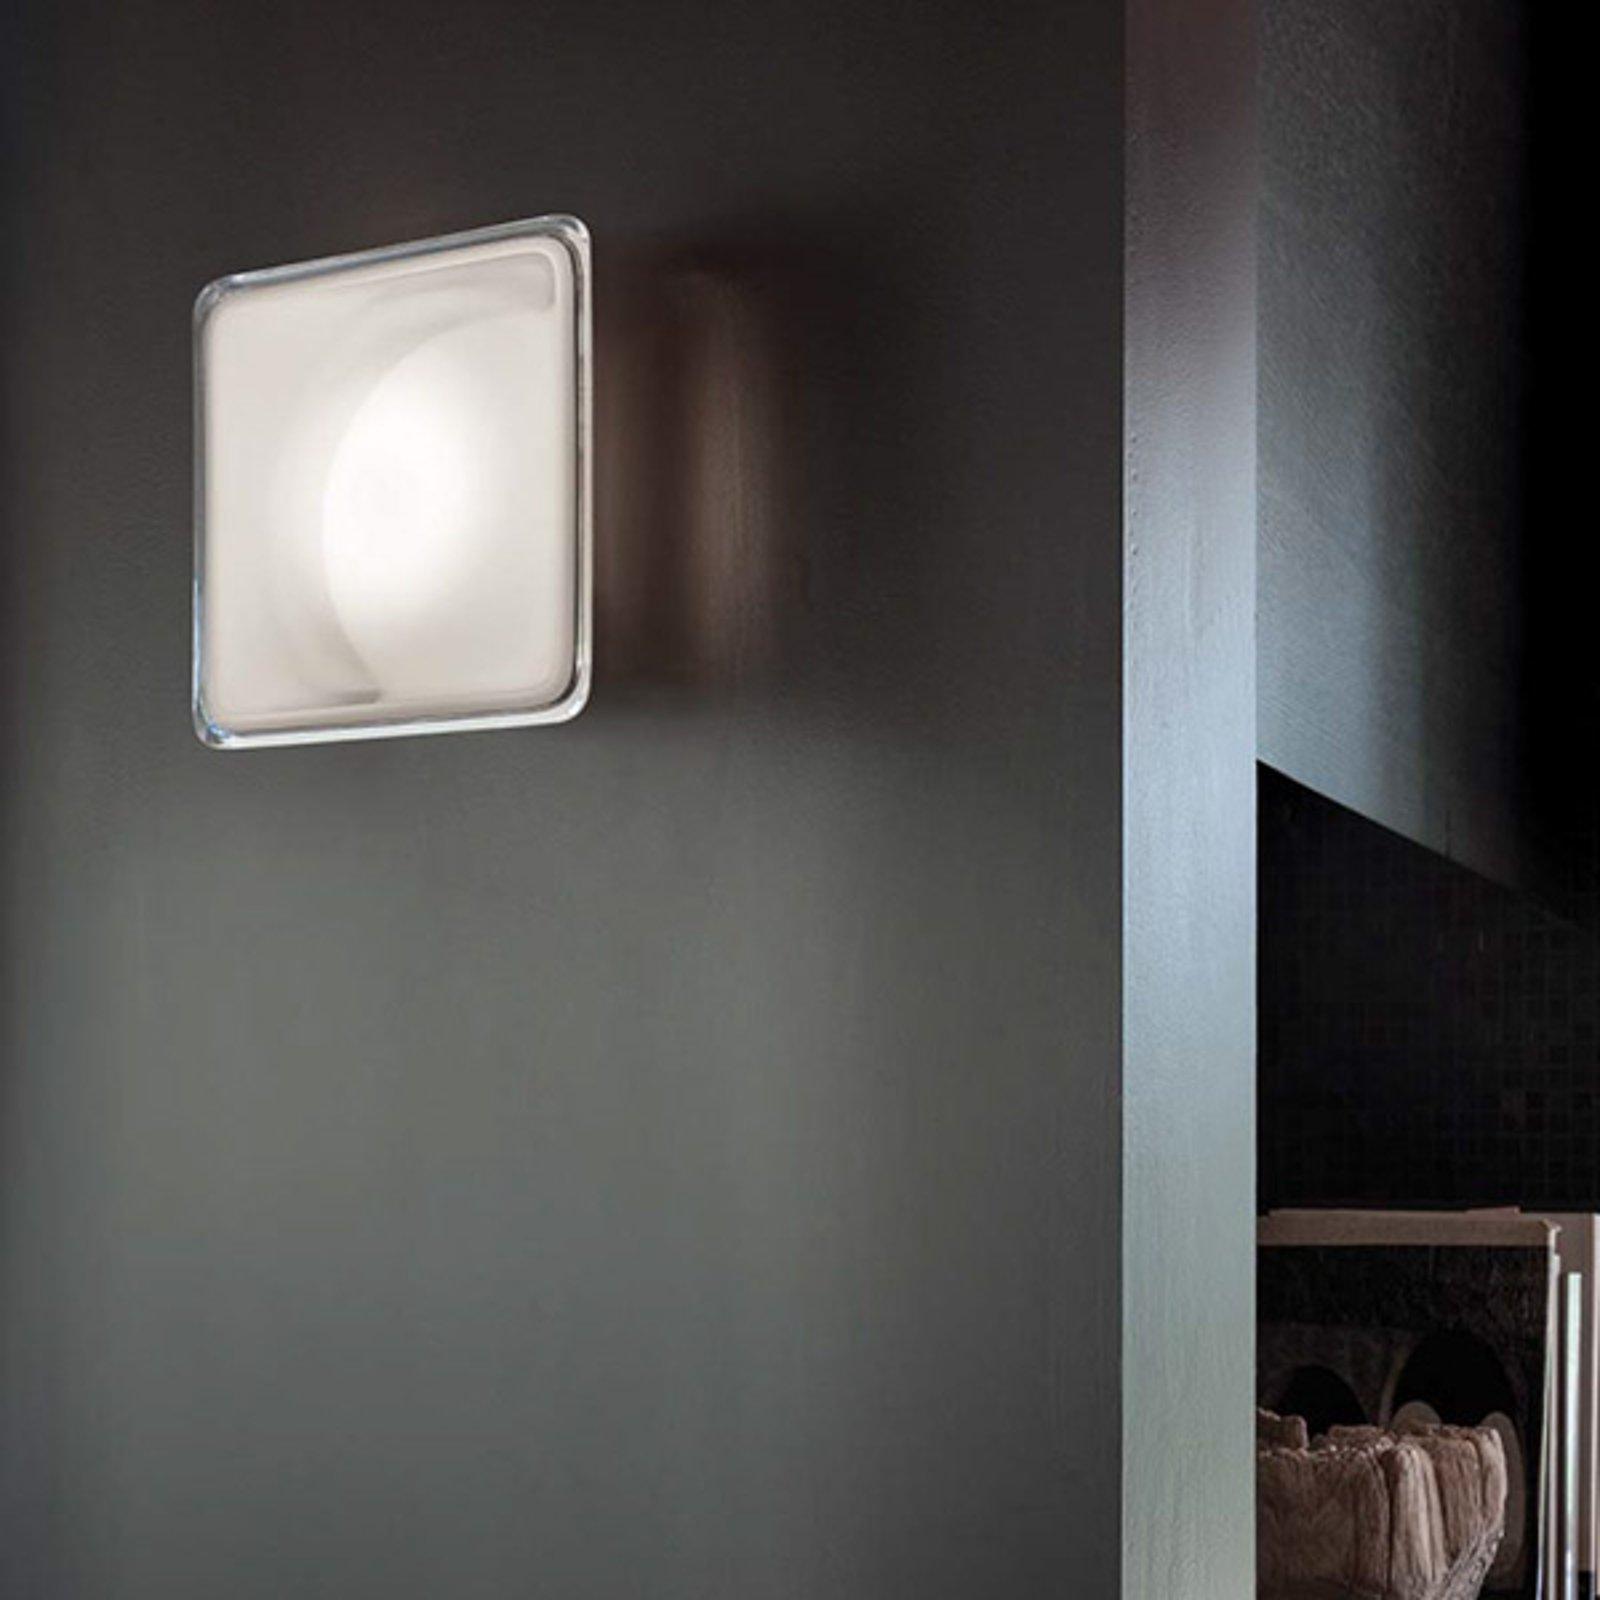 Virkningsfull LED-vegglampe Illusion